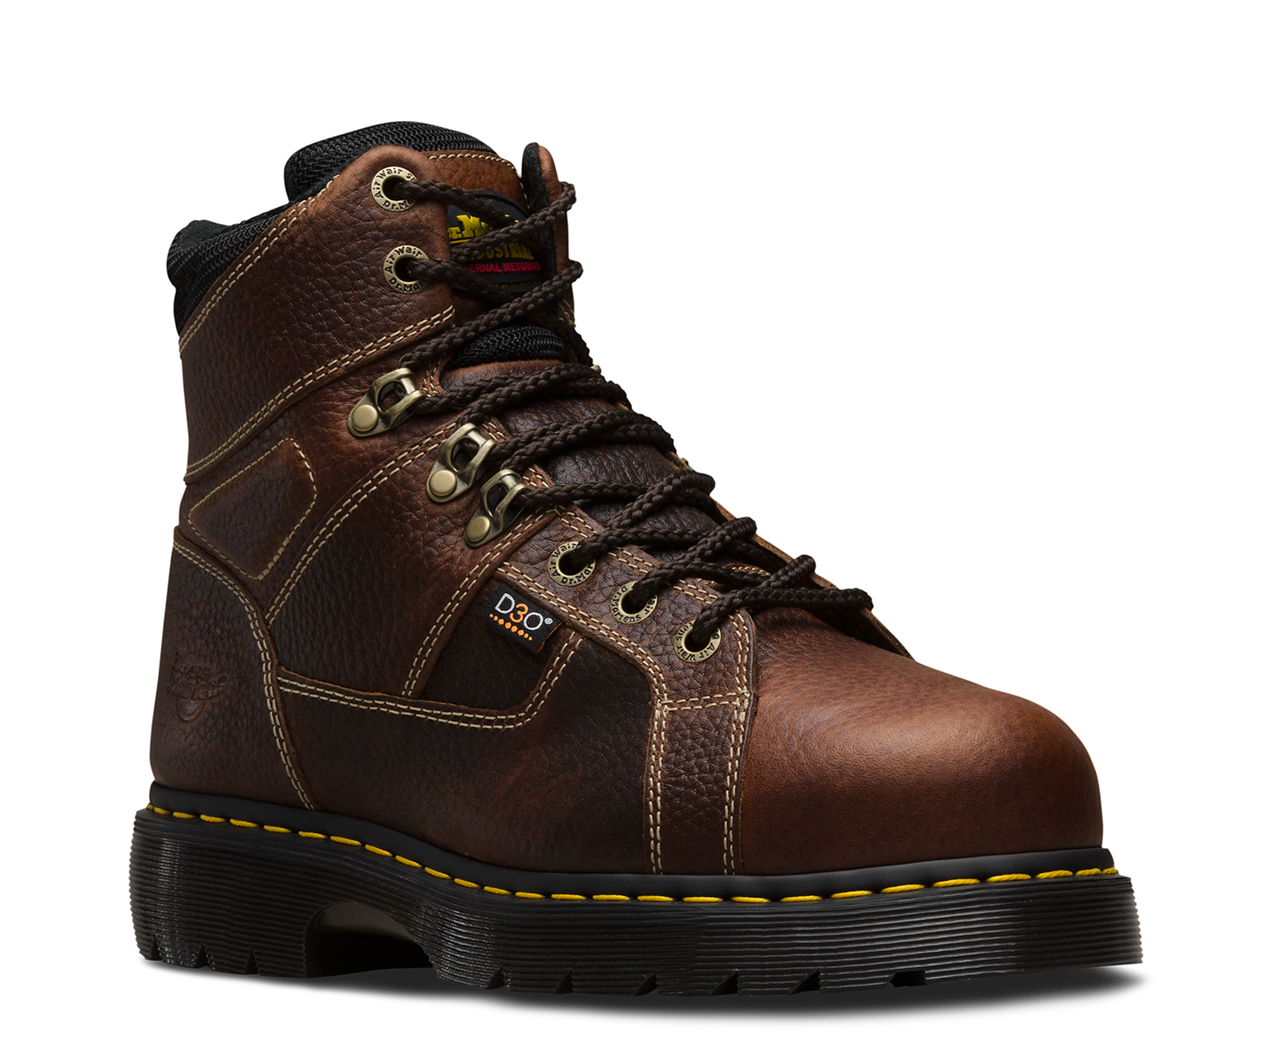 Womens Boots dr martens black work ironbridge st gv7q21n9